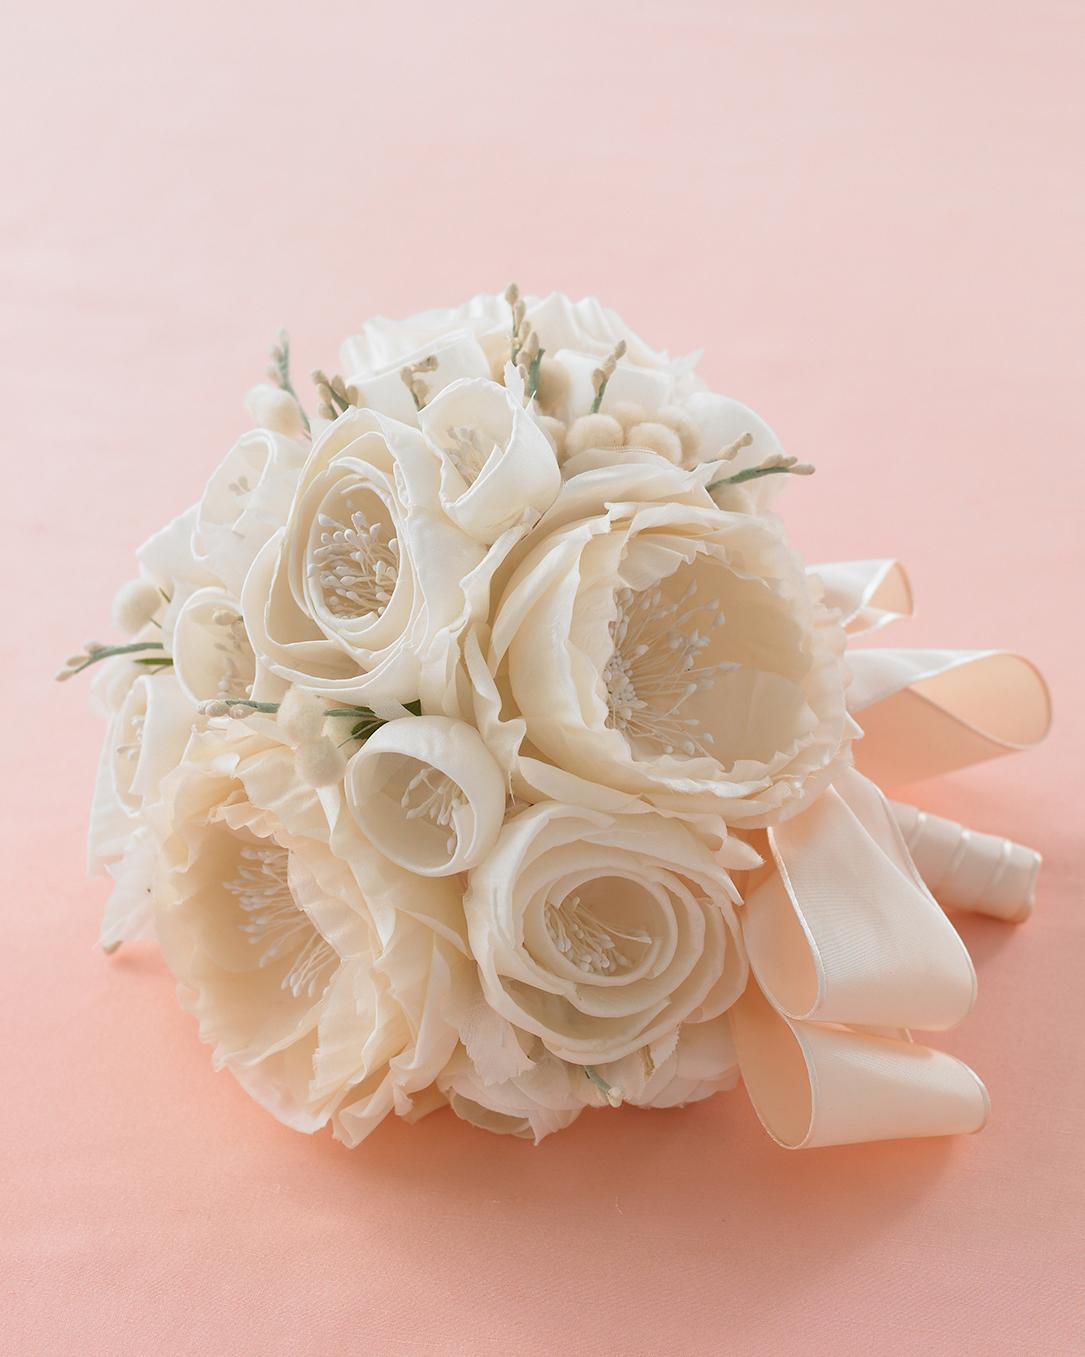 diy-sources-ribbon-flowers-nicholas-kniel-wd103982bouqueta-1014.jpg